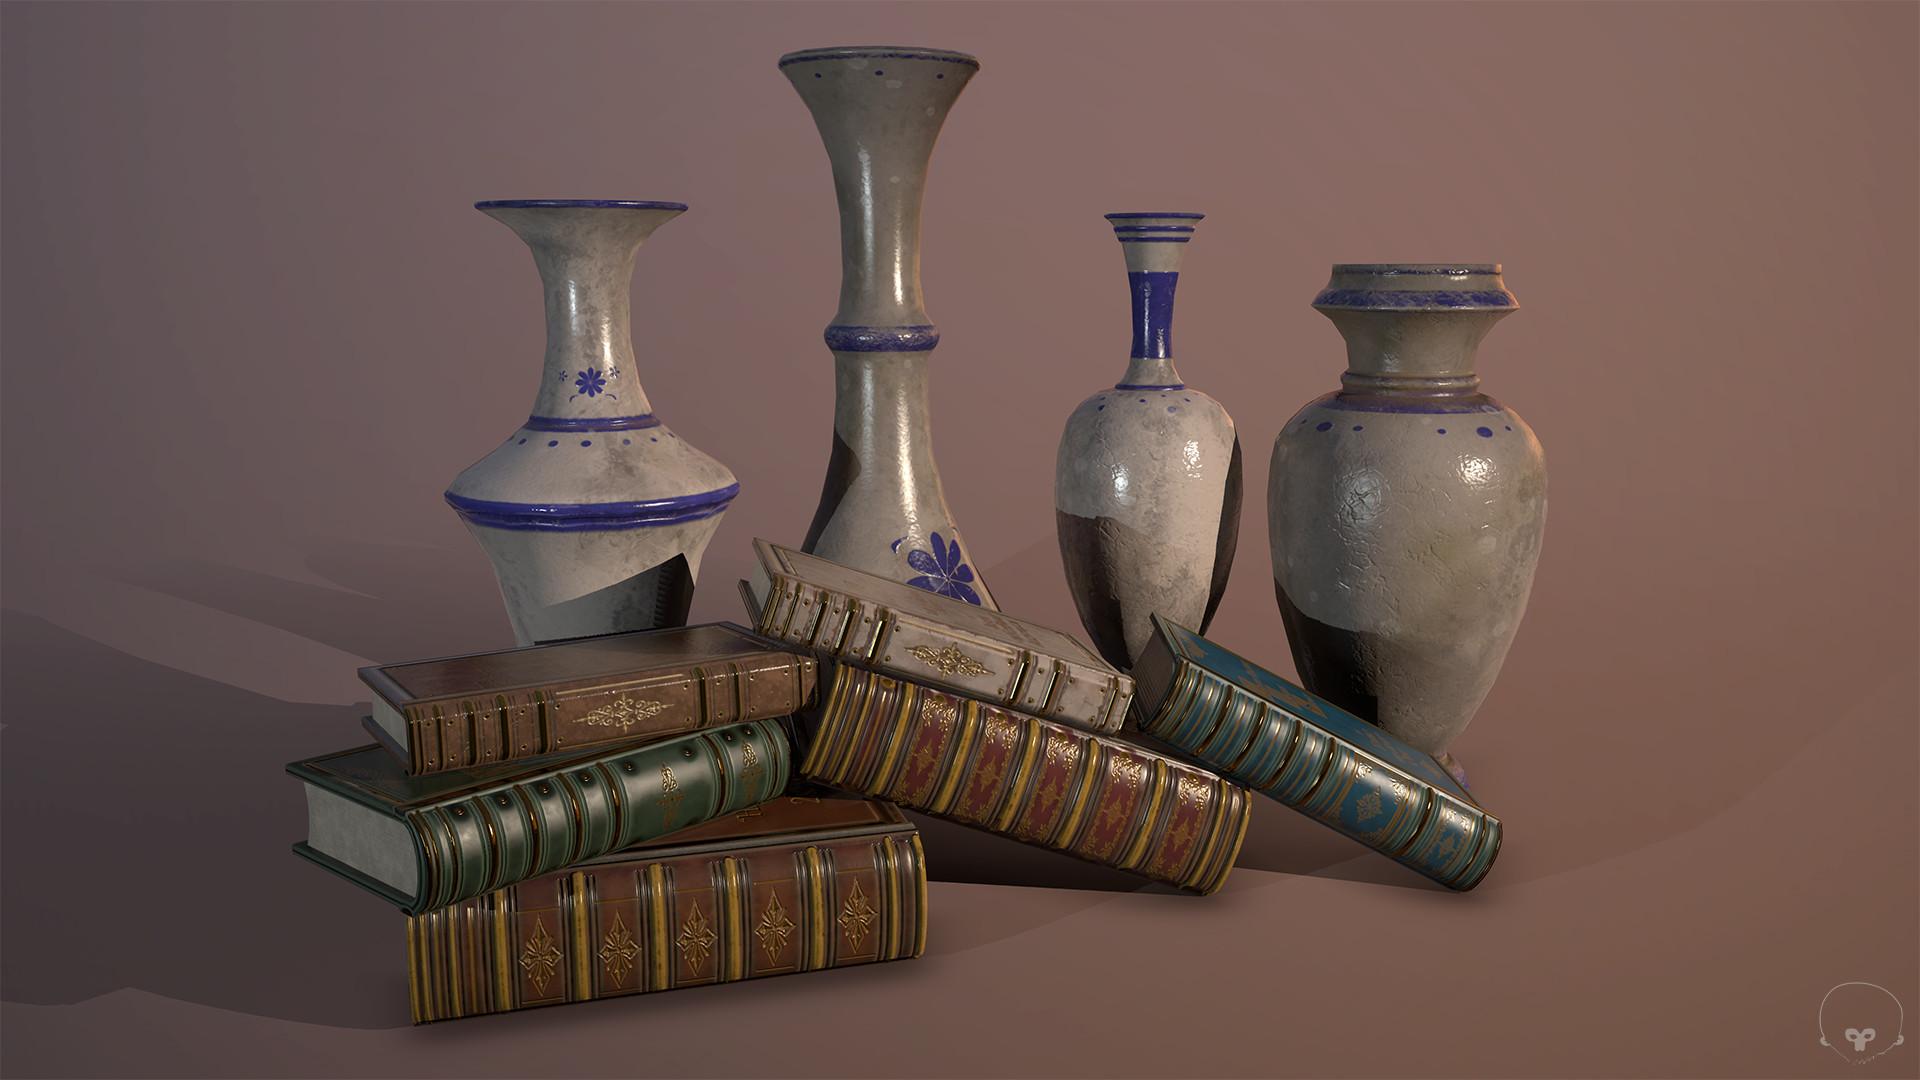 Paul mandegarian books vase 01